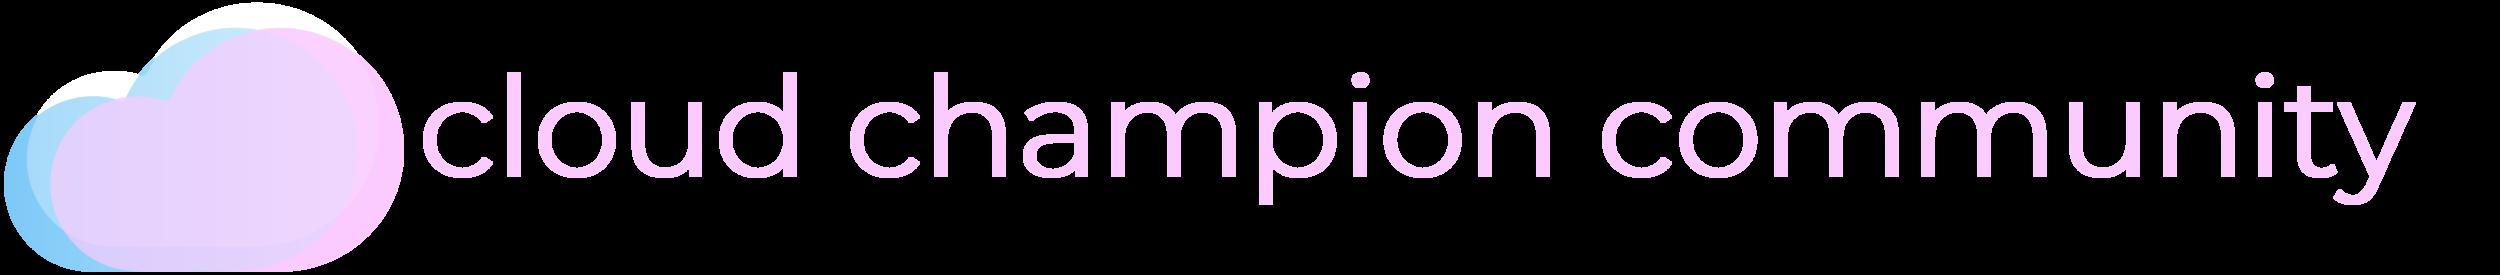 CloudChampionLogo